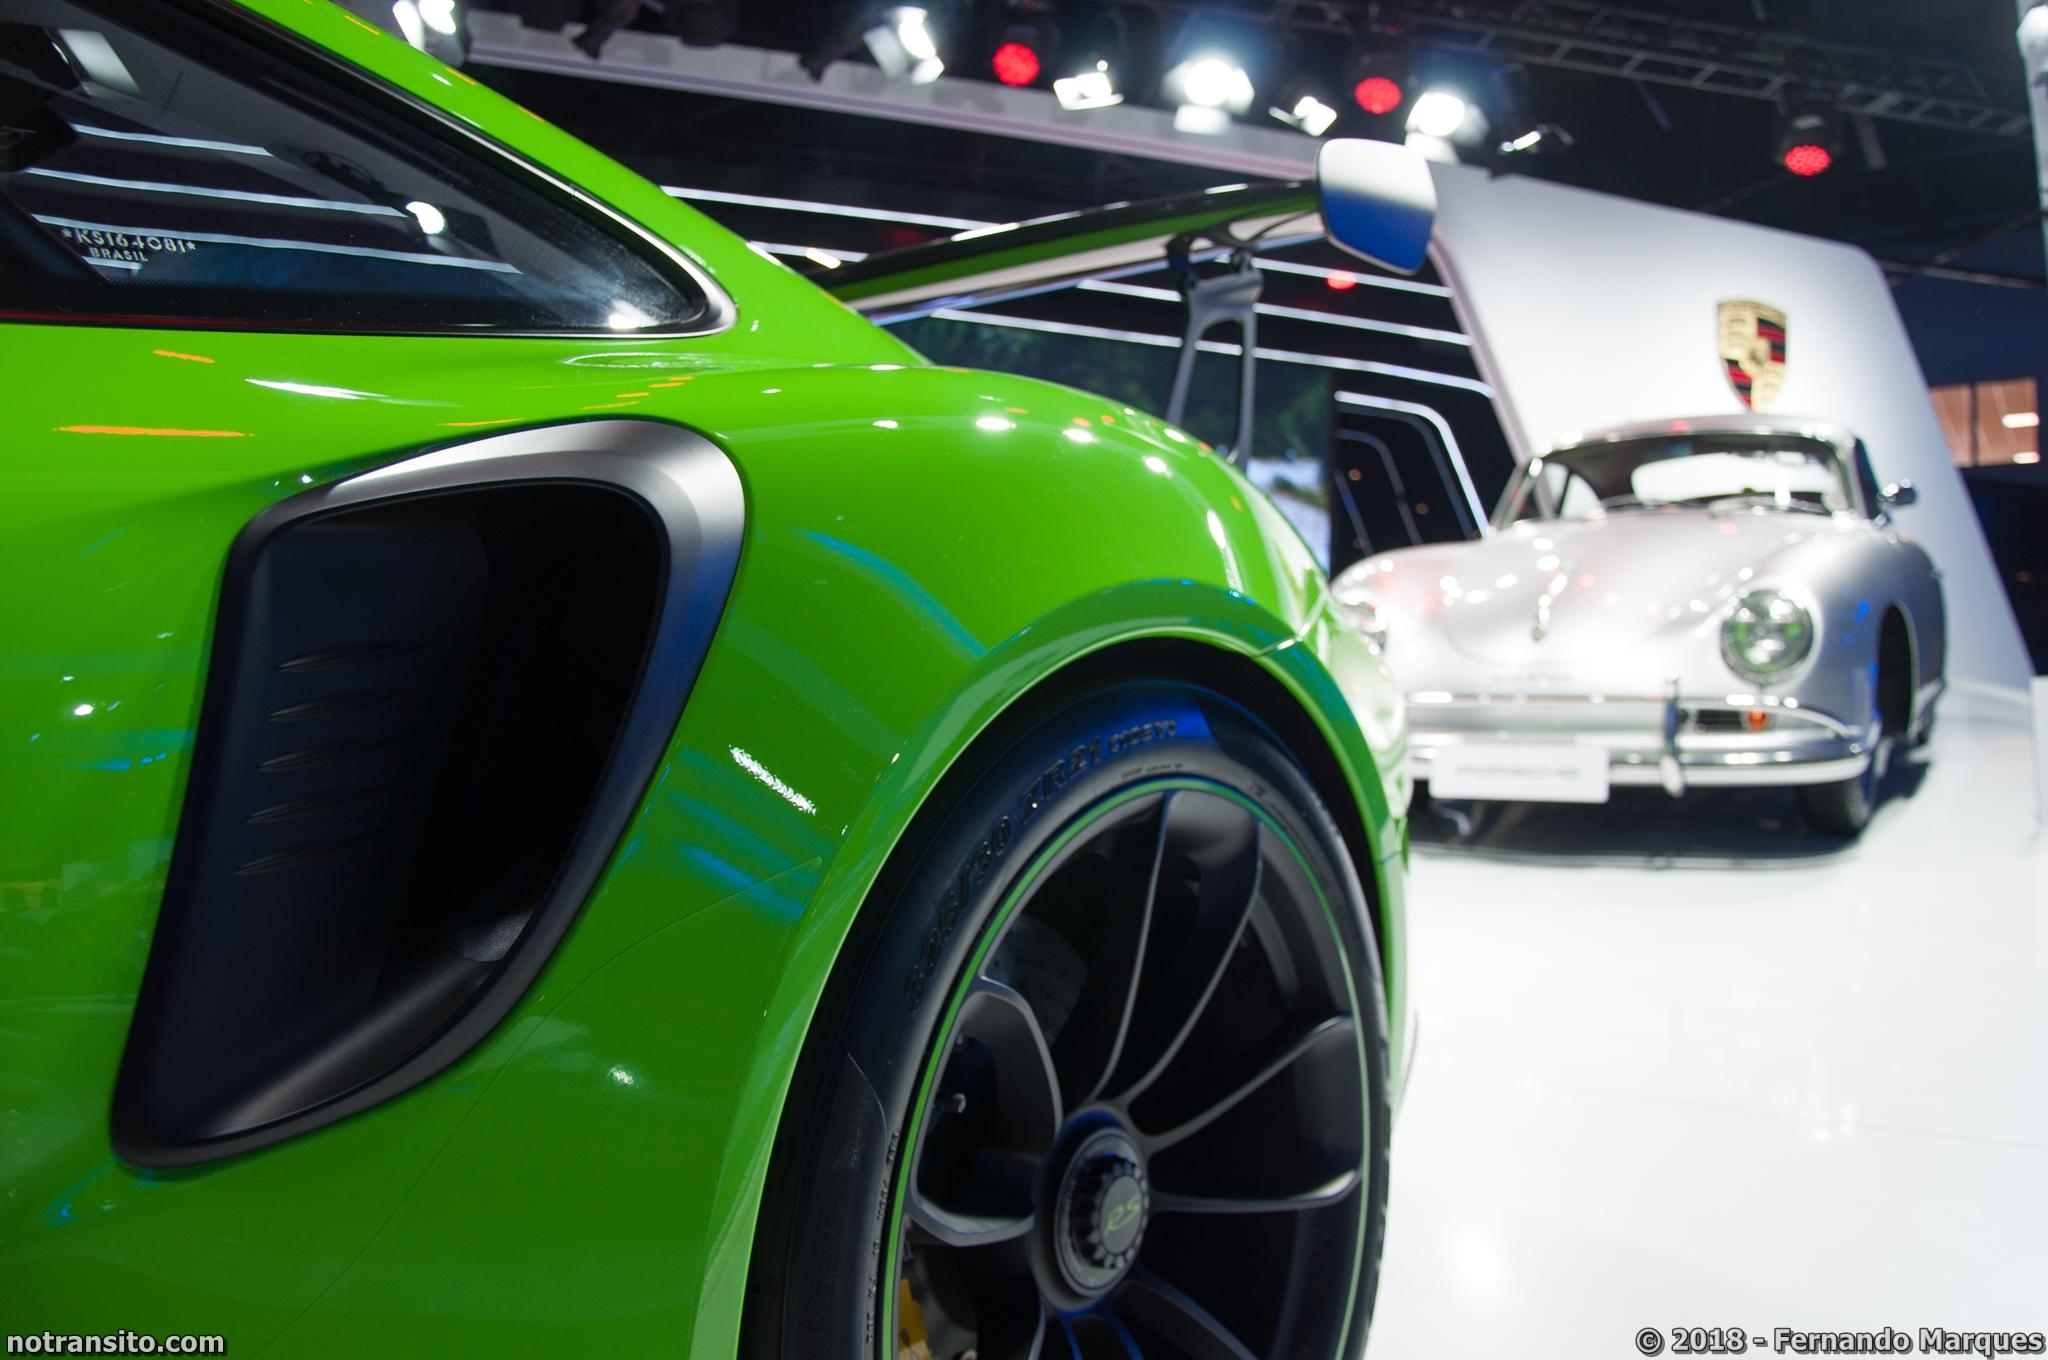 Salão2018-Porsche911GT3RS-17